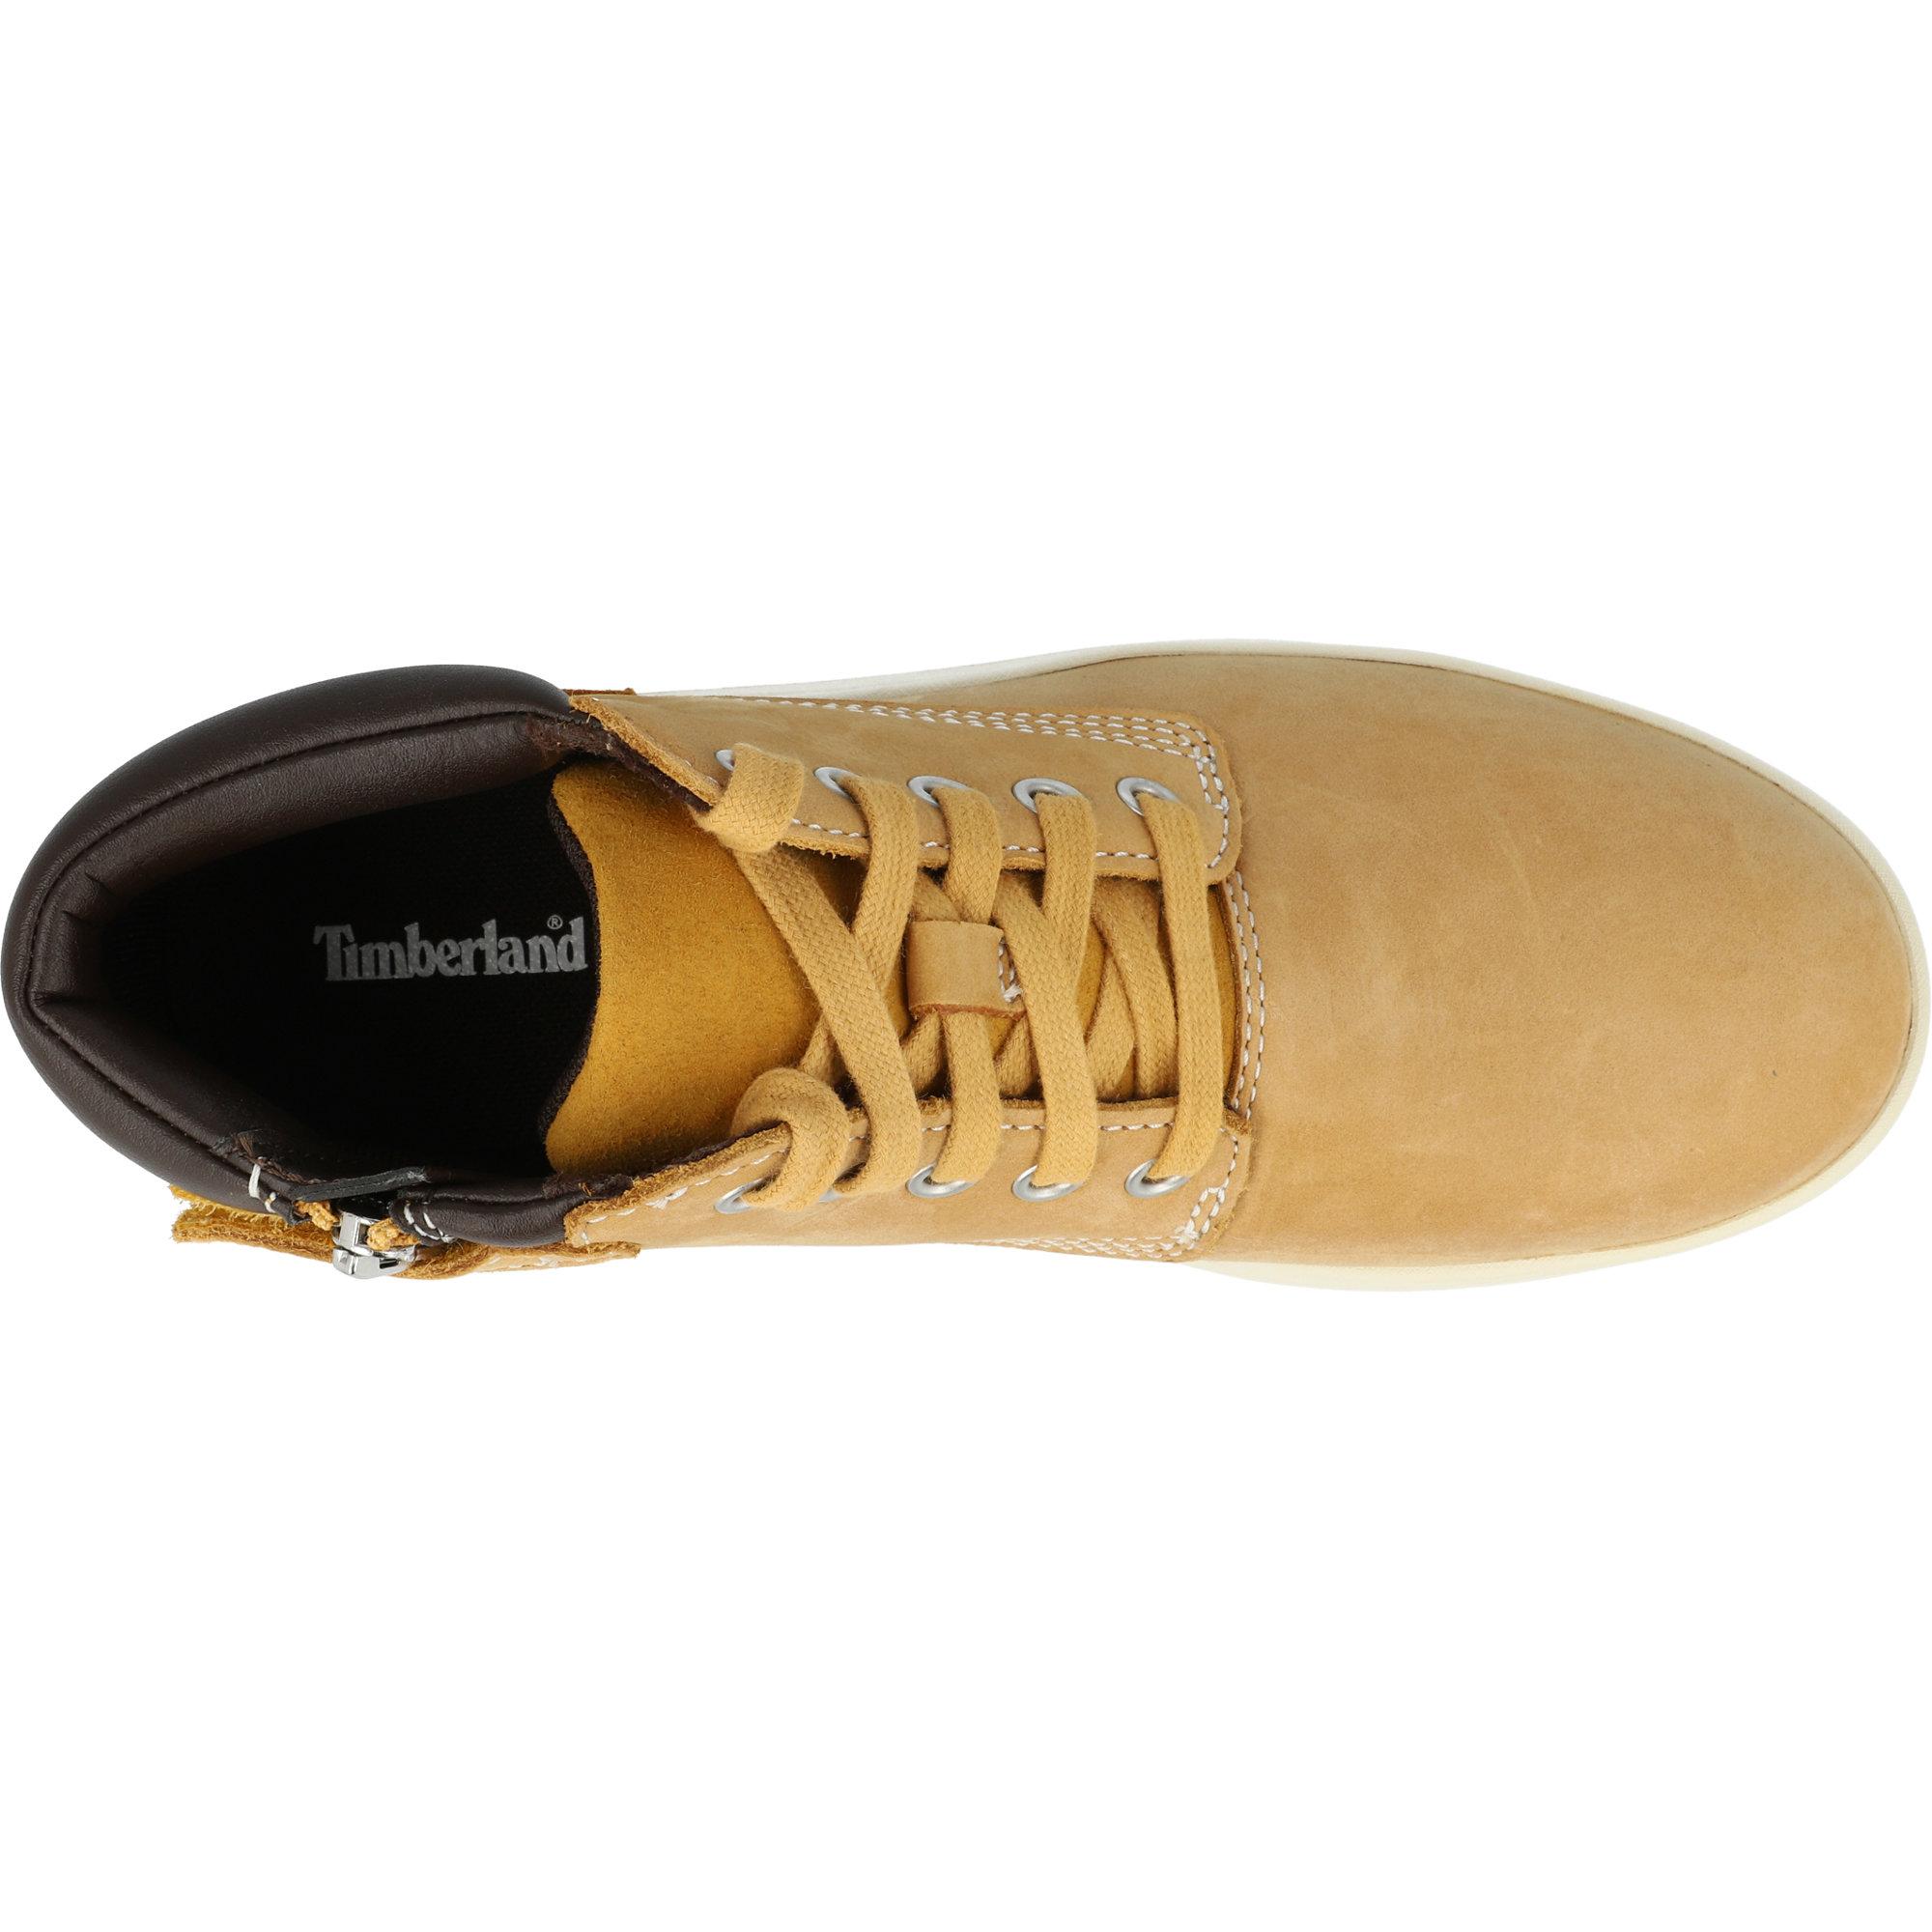 Timberland Youths Boys//Girls Boots Leather Wheat Davis Square Sizes UK3.5-UK6.5